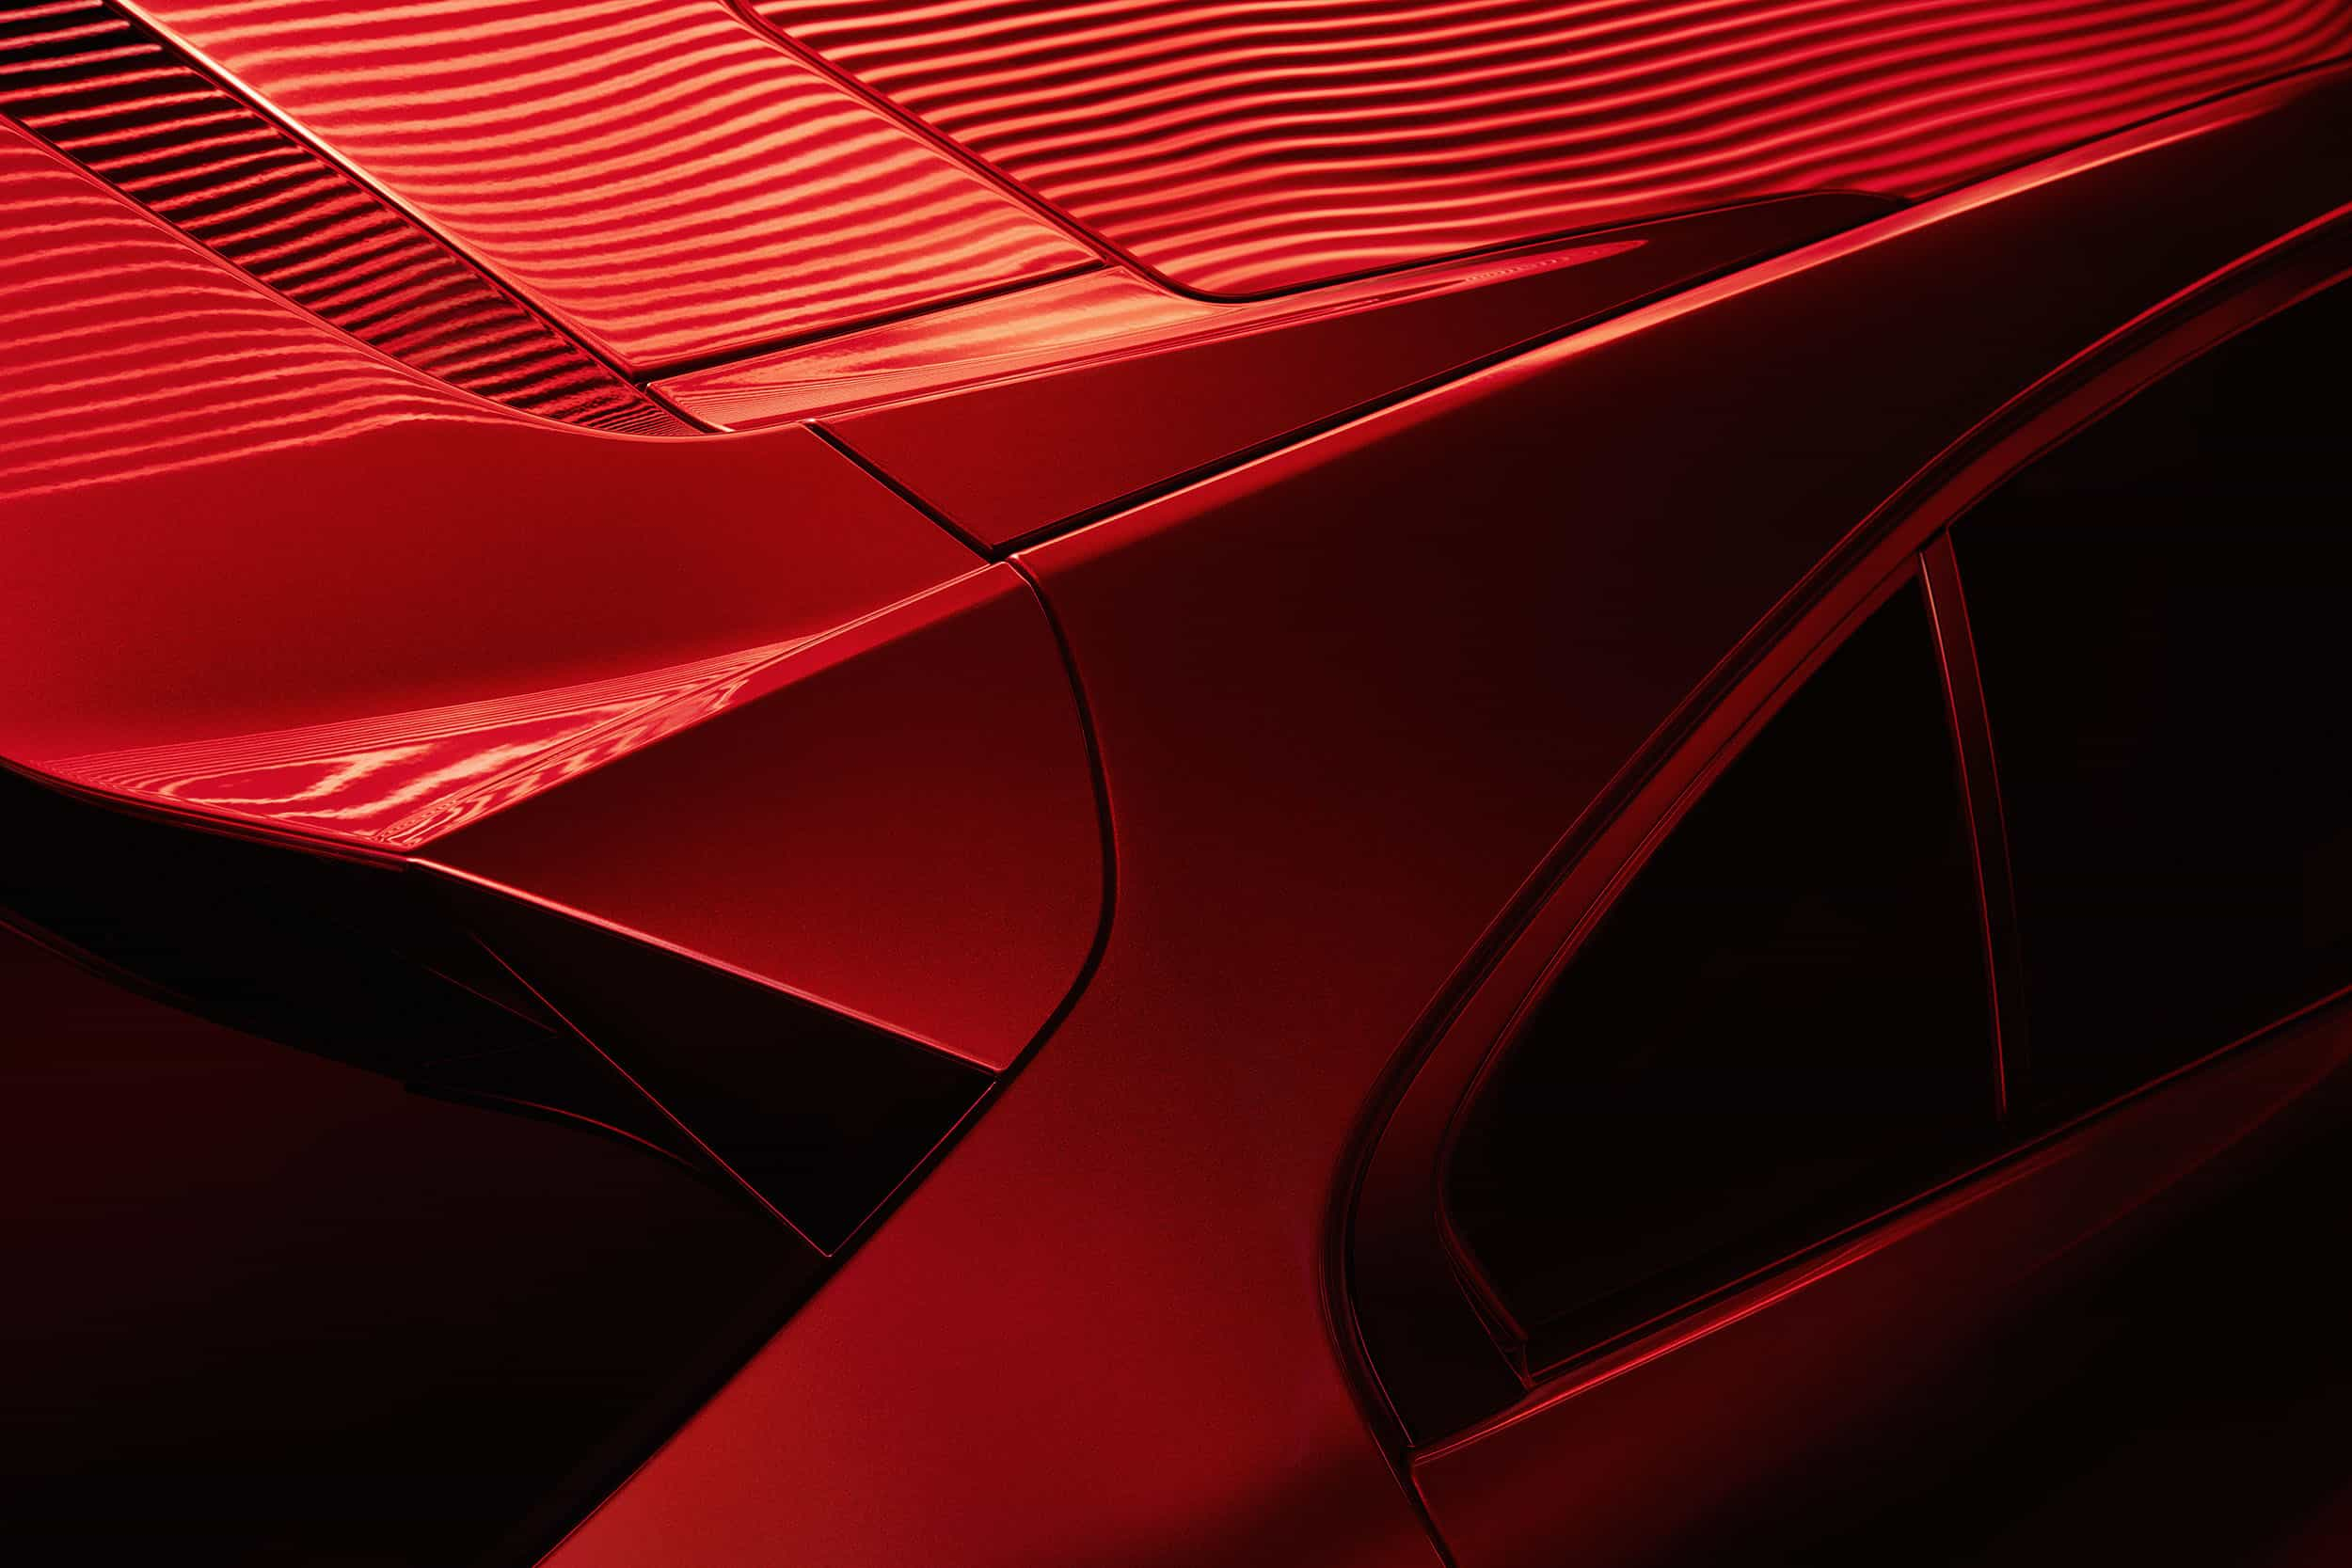 studio-ignatov-wkw-automotive-imagekampagne-02